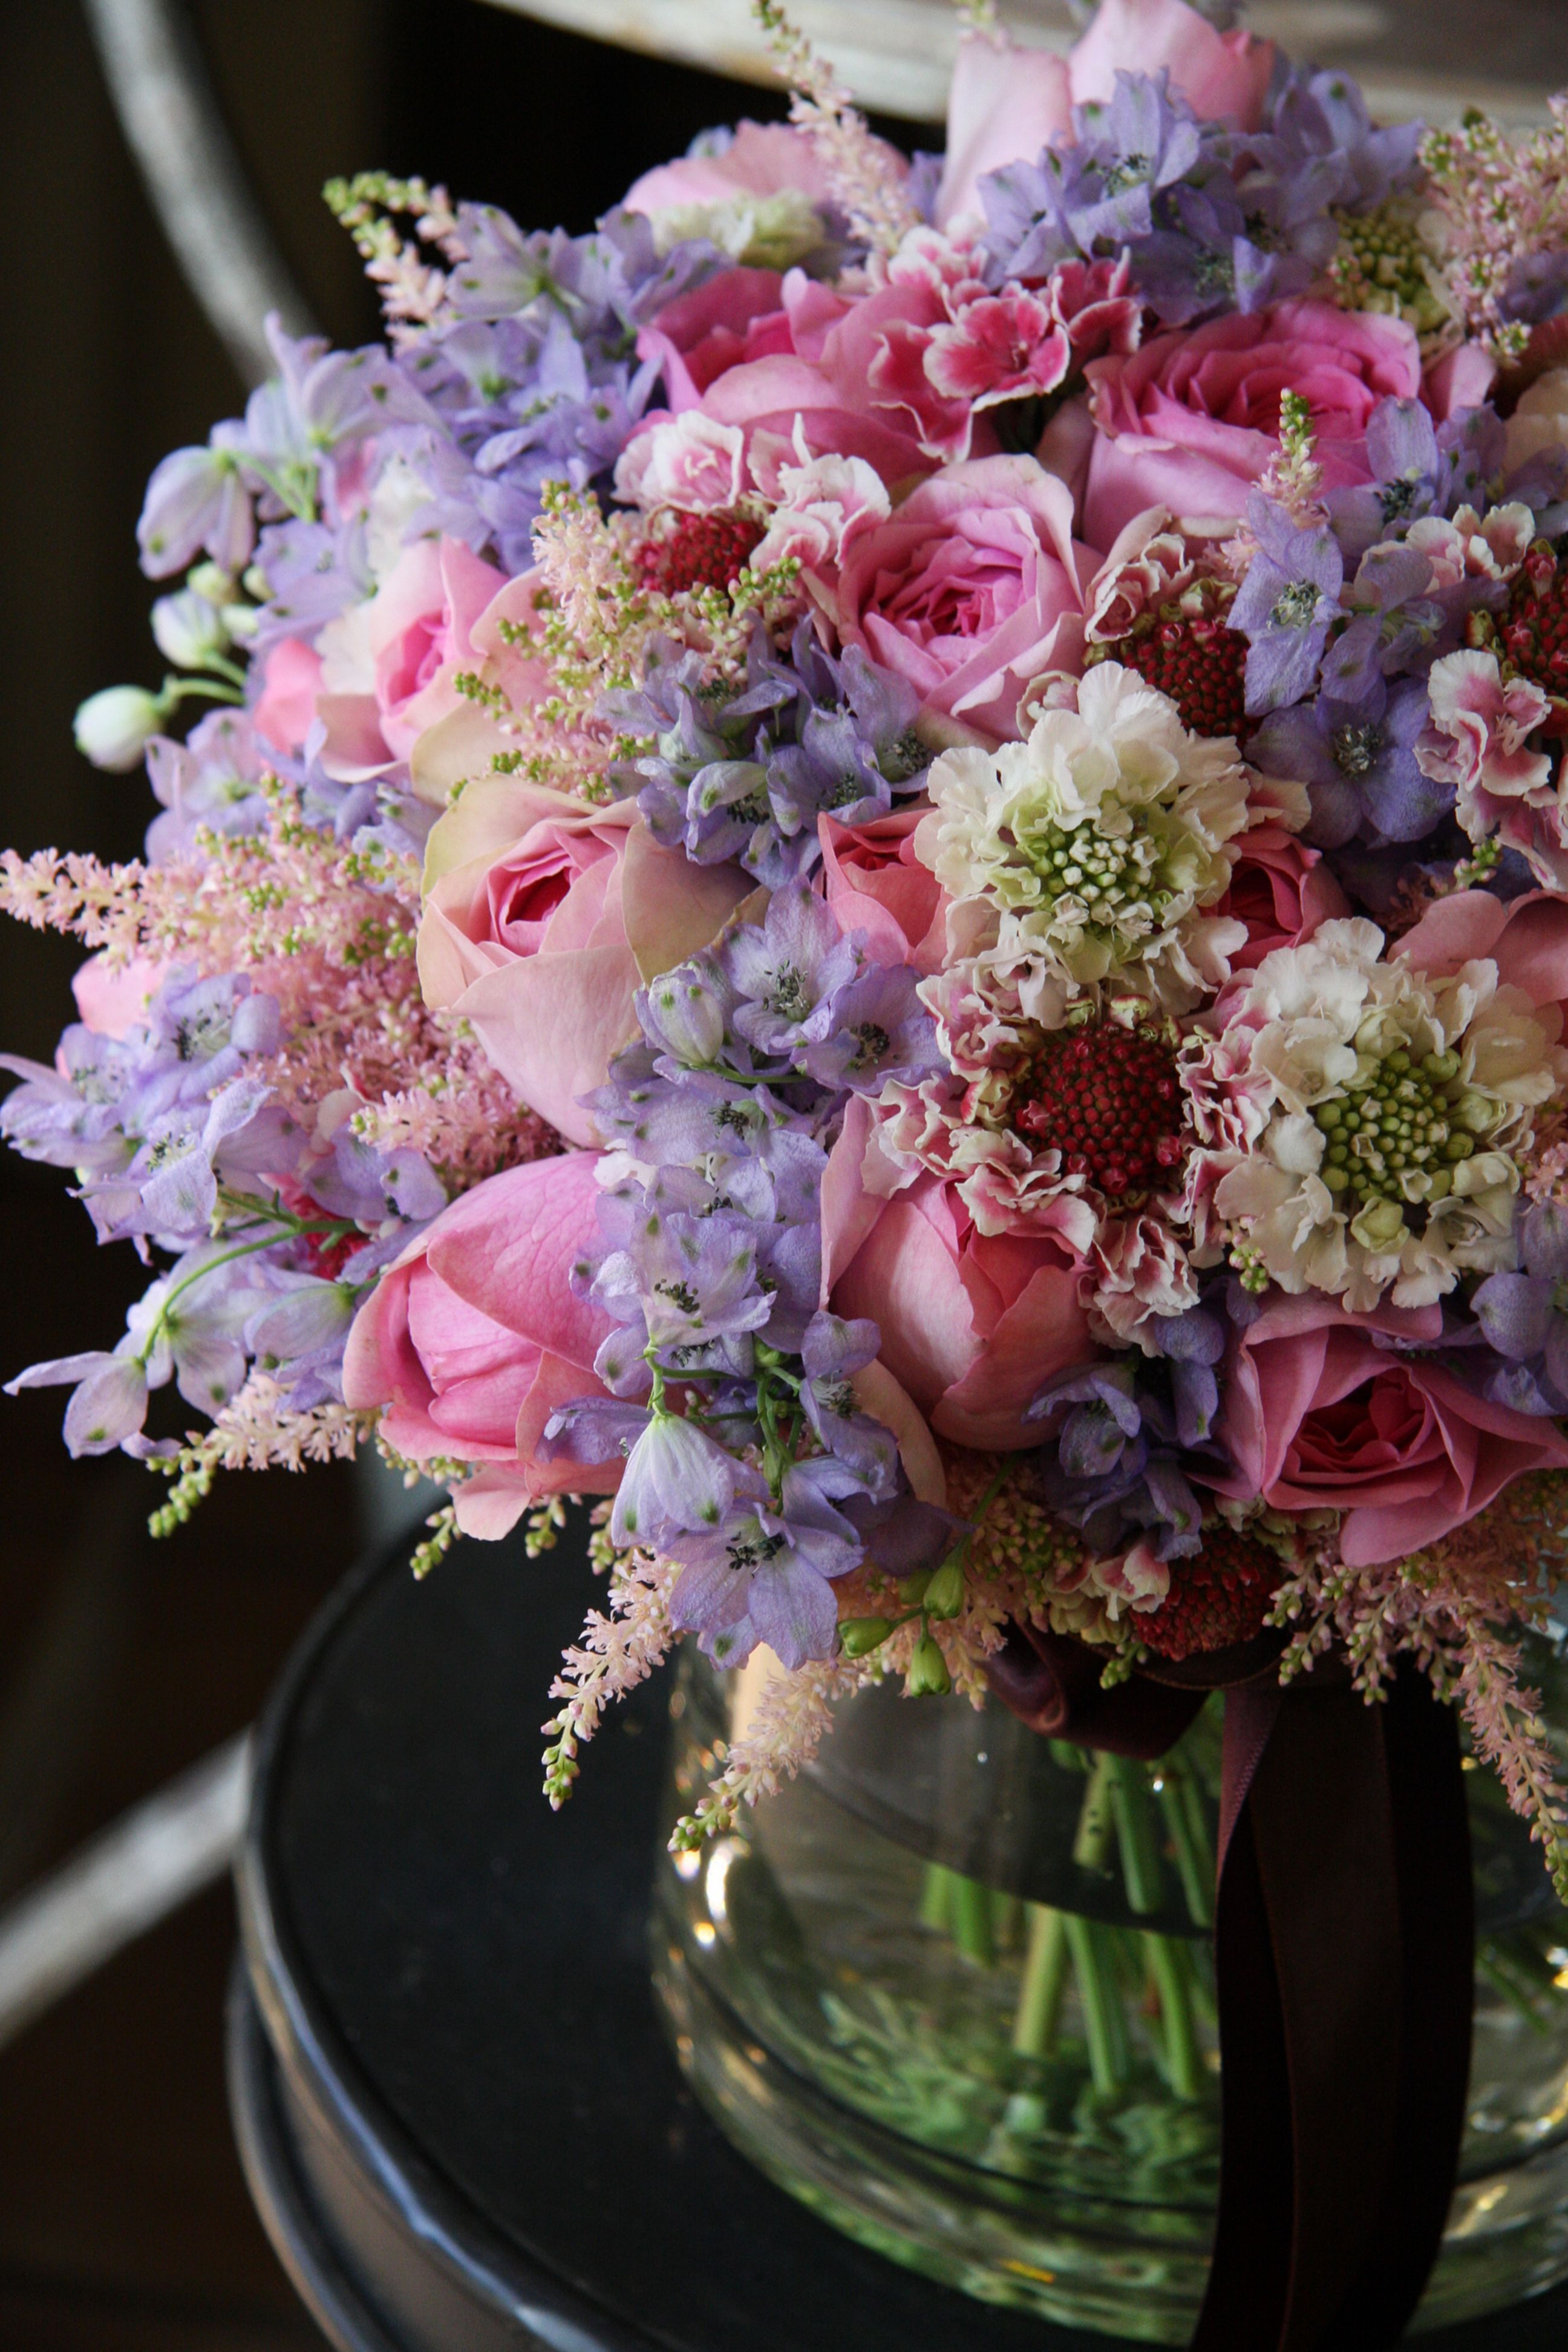 60 Wonderful Rose Arrangement Ideas For Your Girlfriend Flowers